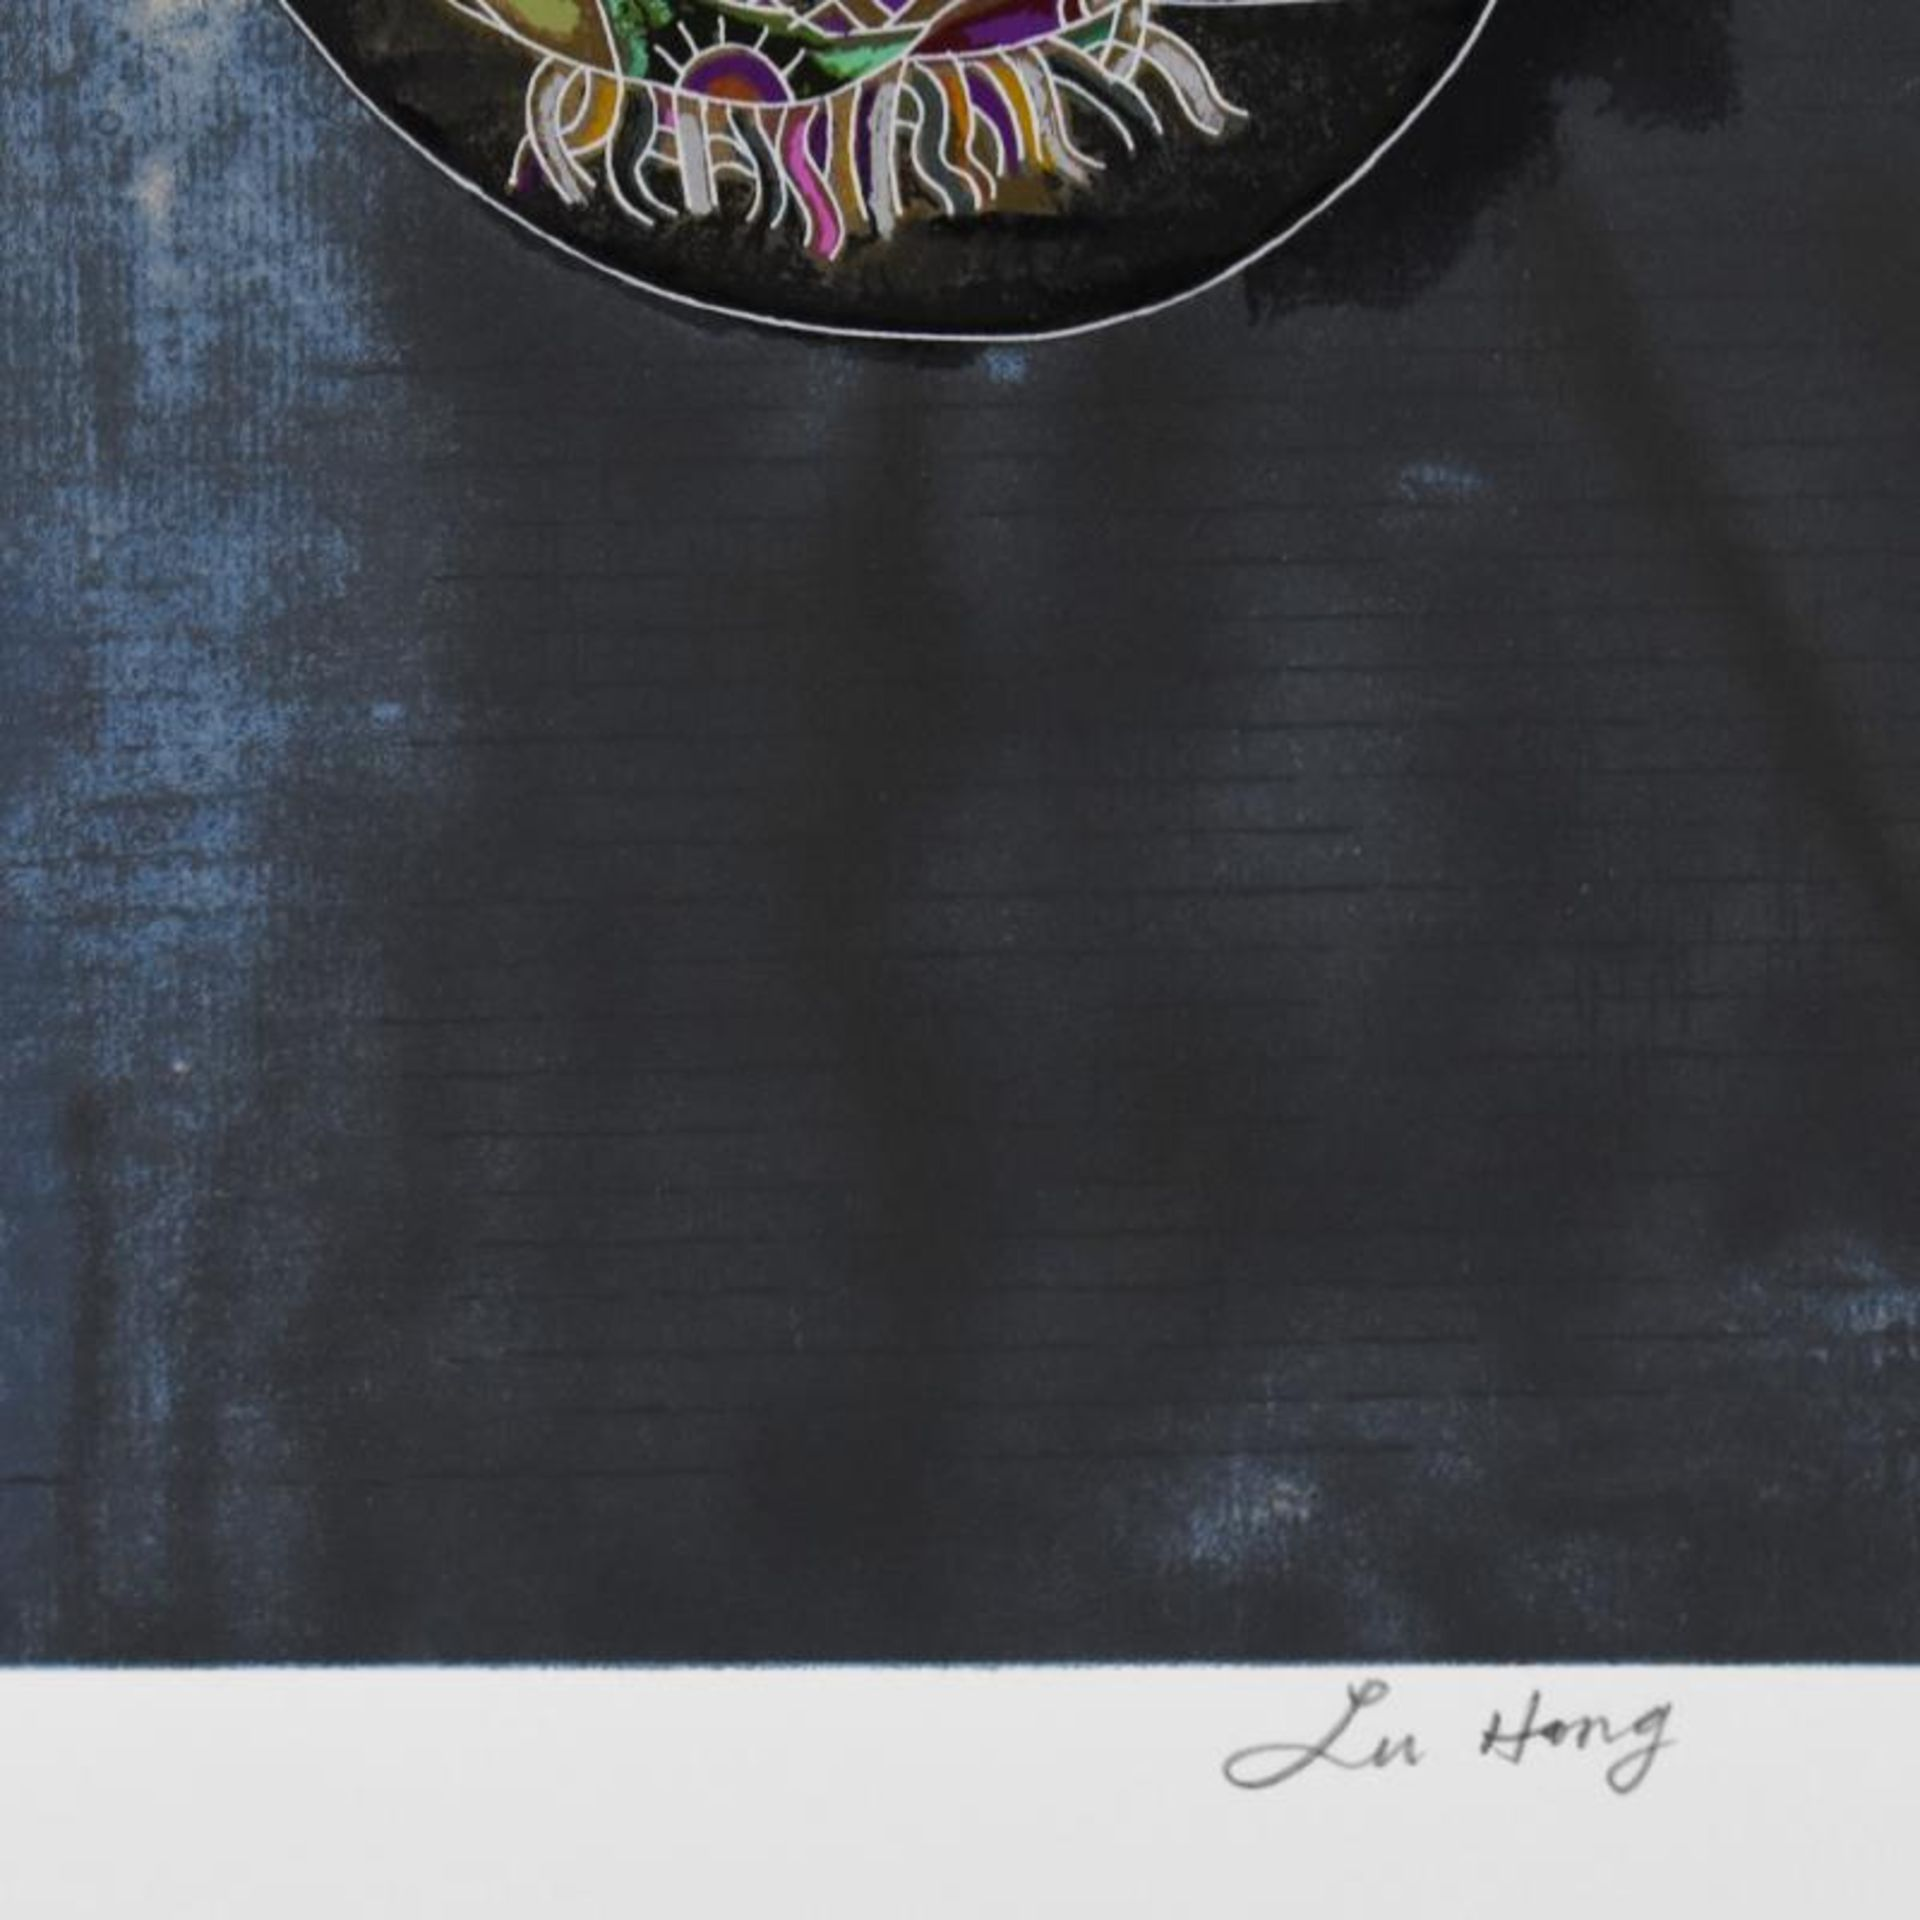 Spirit of Tropics by Hong, Lu - Image 2 of 2